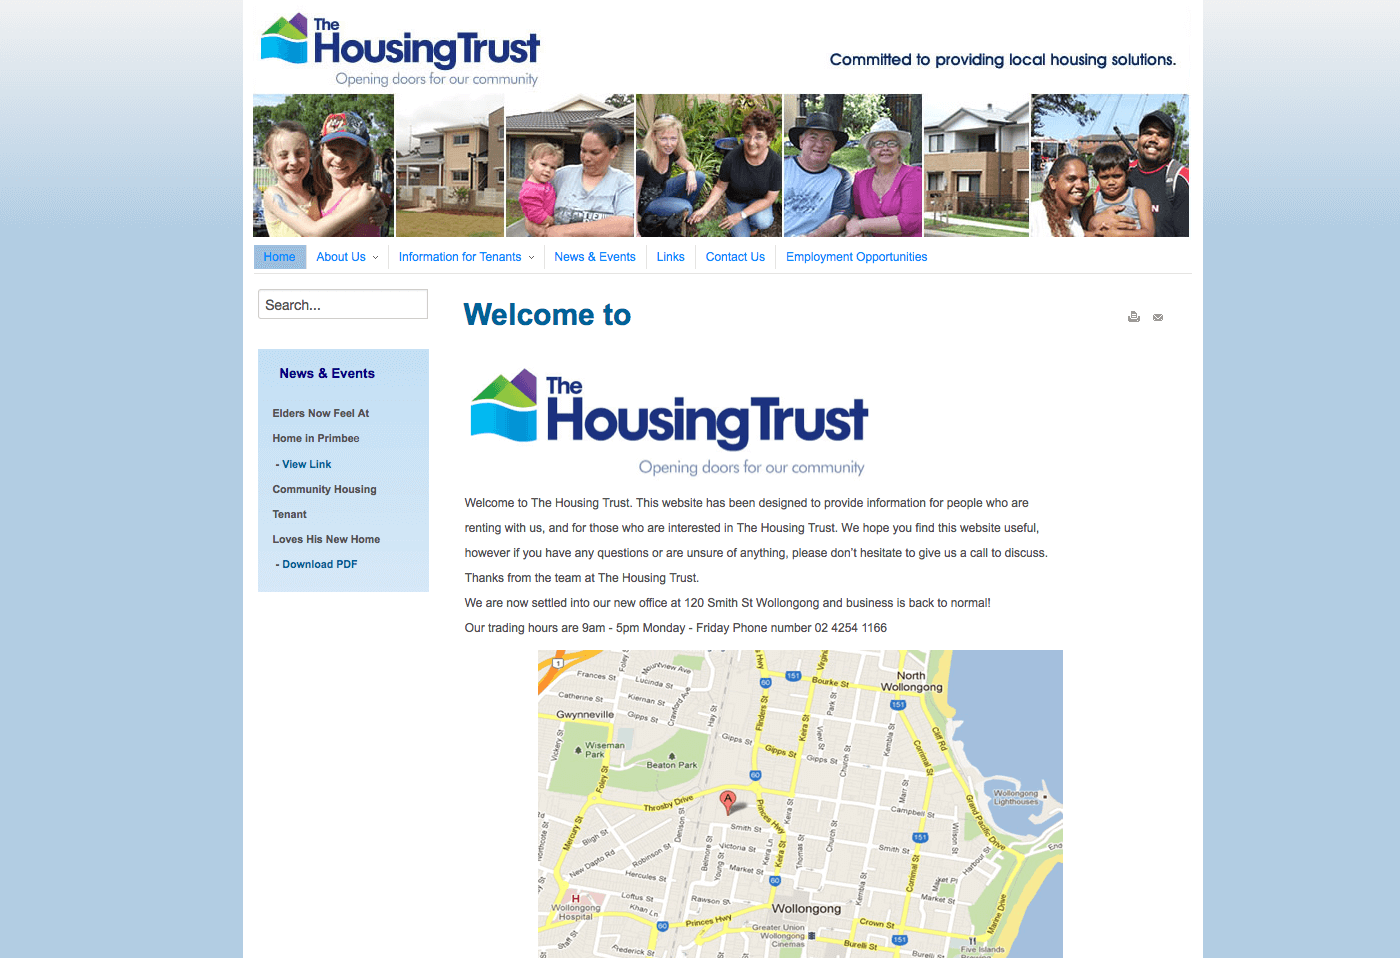 The Housing Trust